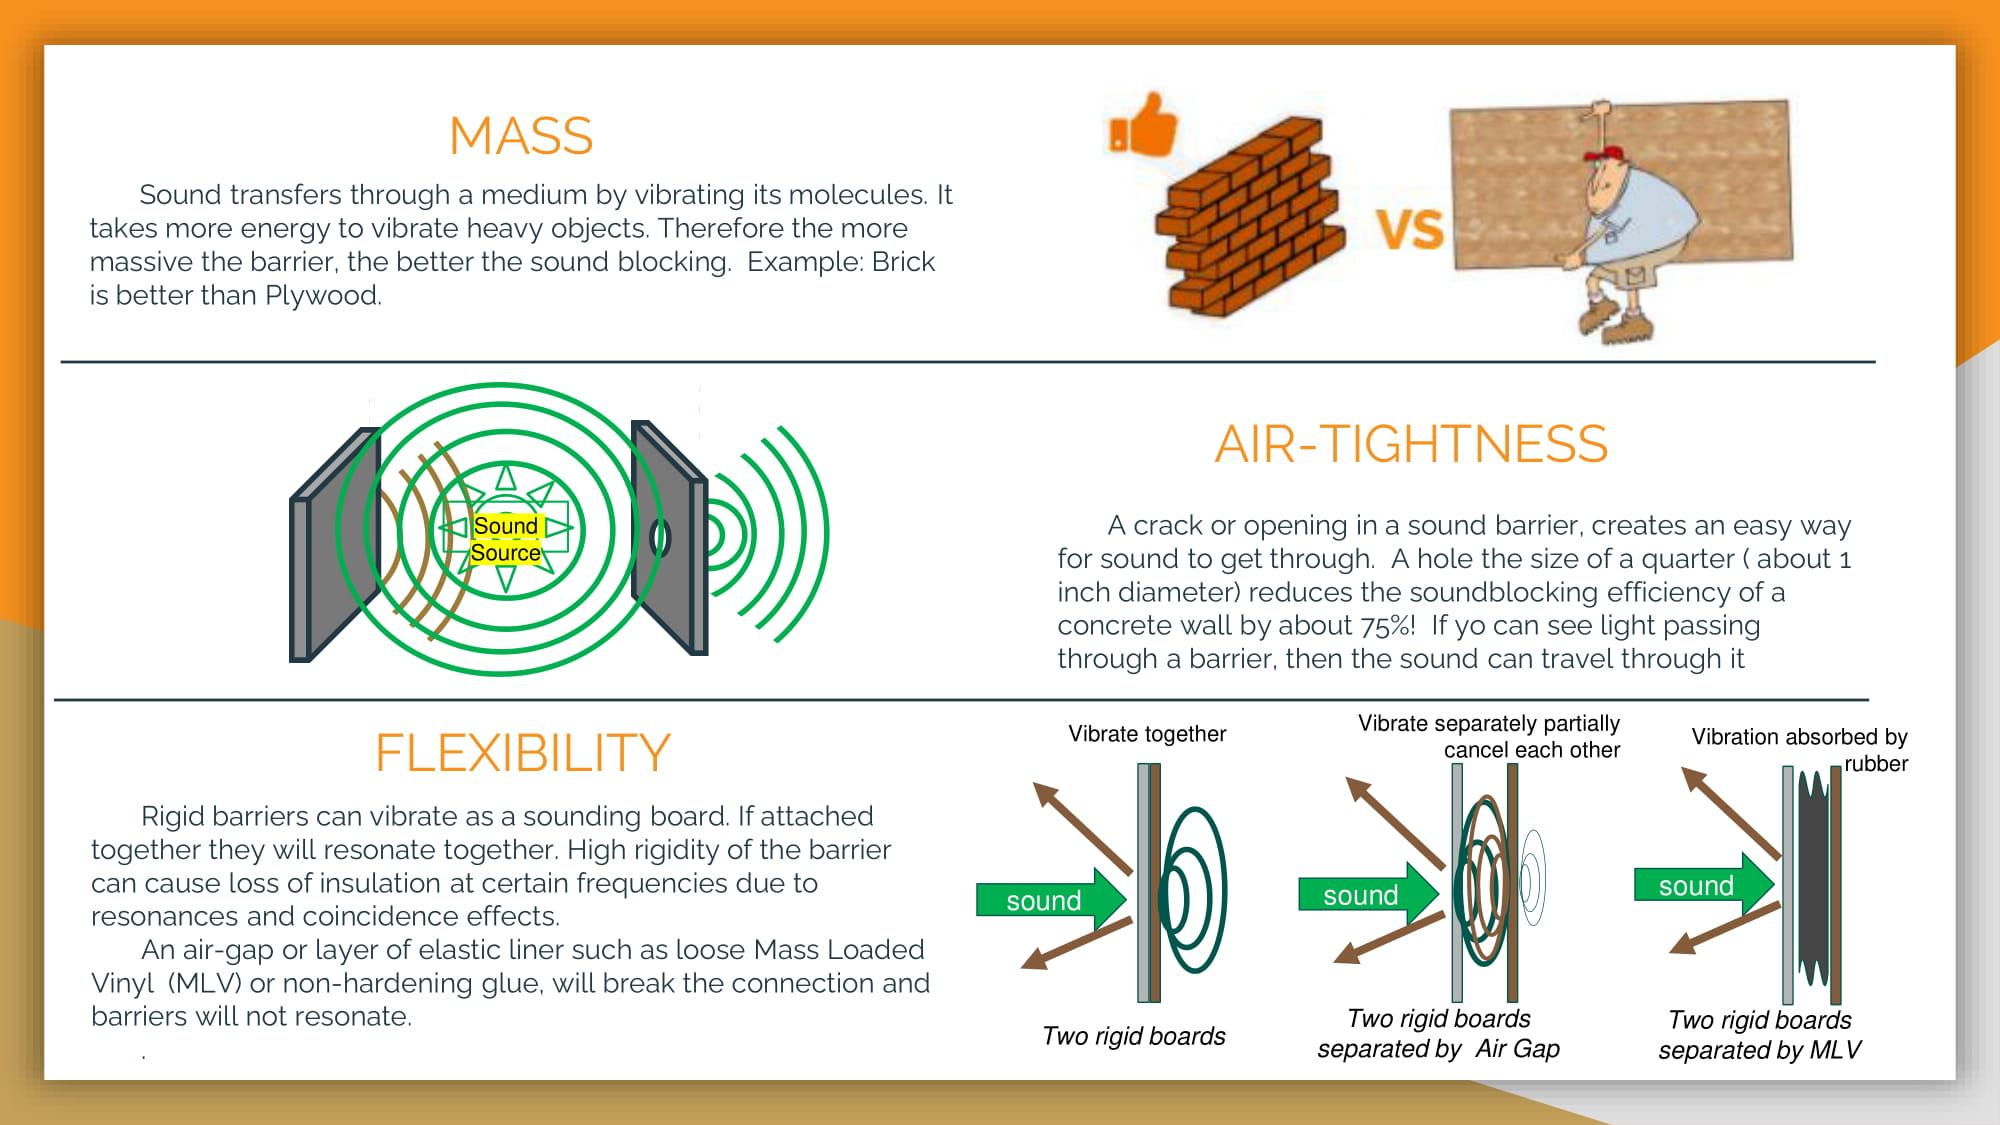 MASS Sound transfers through a medium by vibrating its molecules